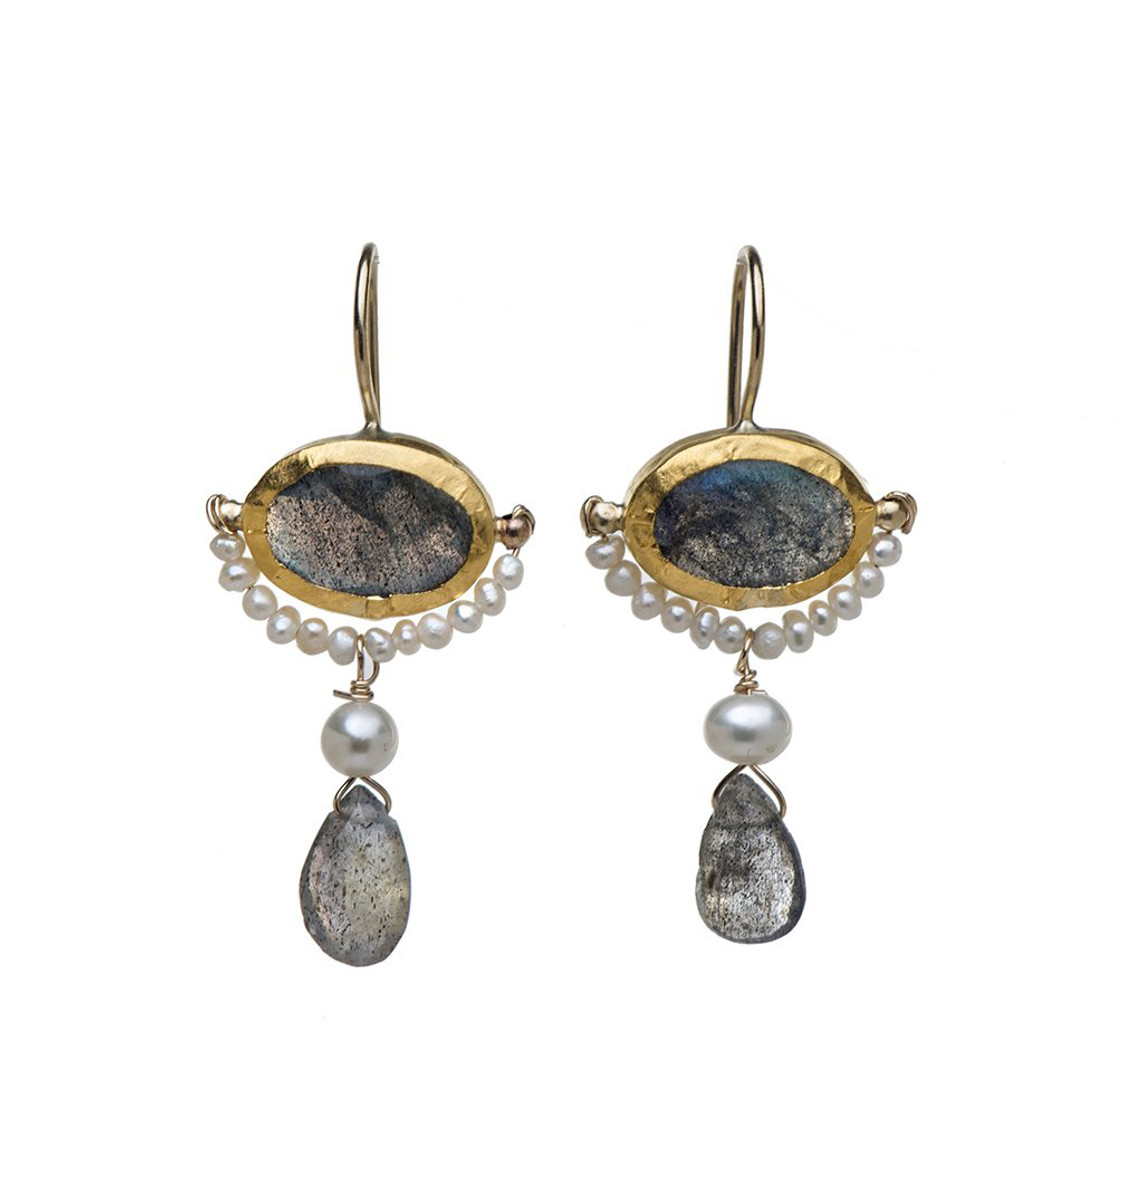 Aurora Earrings by Nava Zahavi - New Arrival